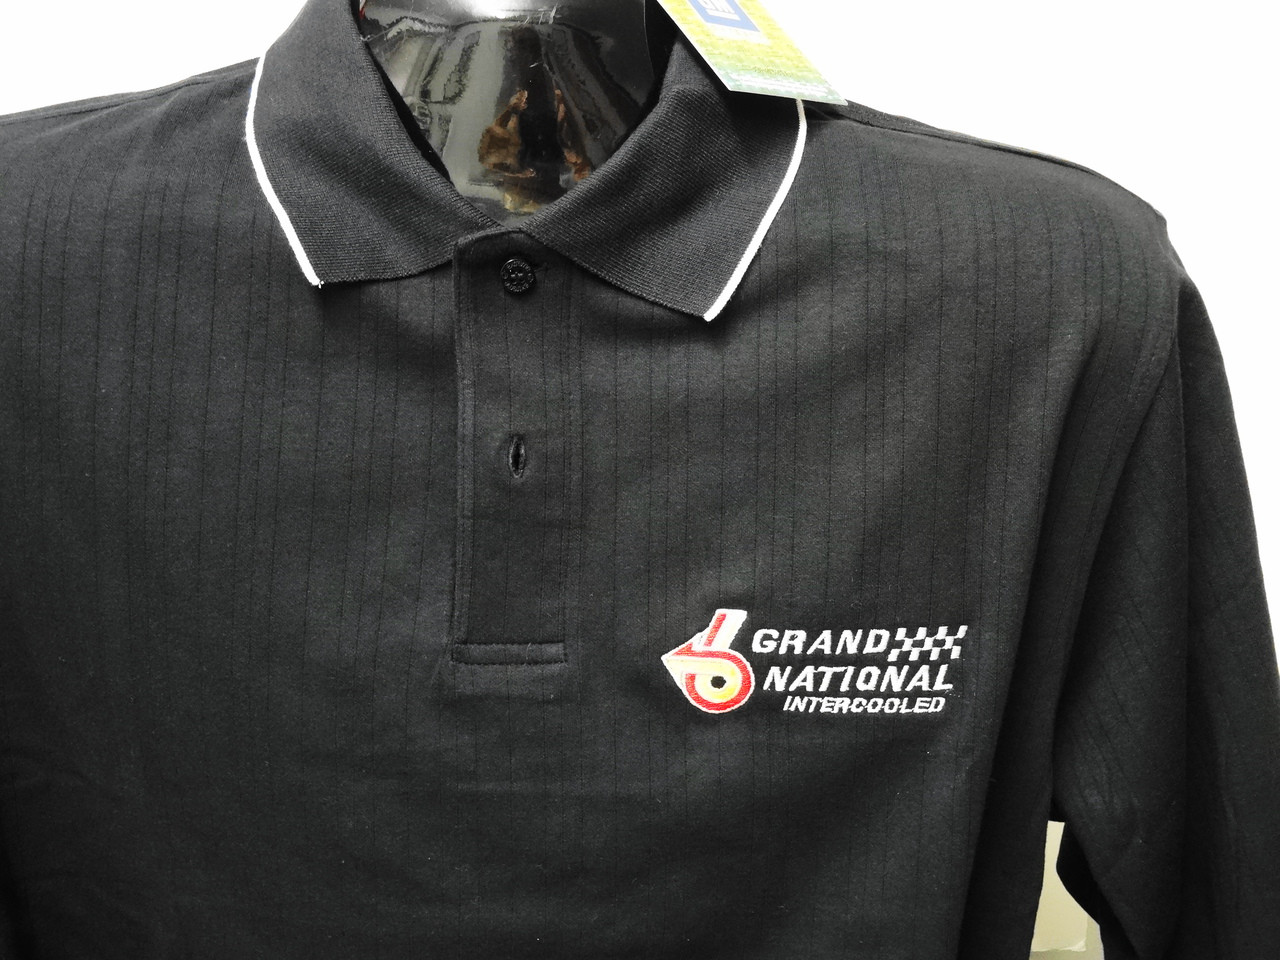 GRAND NATIONAL INTERCOOLED TURBO BUICK GM  POLO SHIRT GREY//BLK